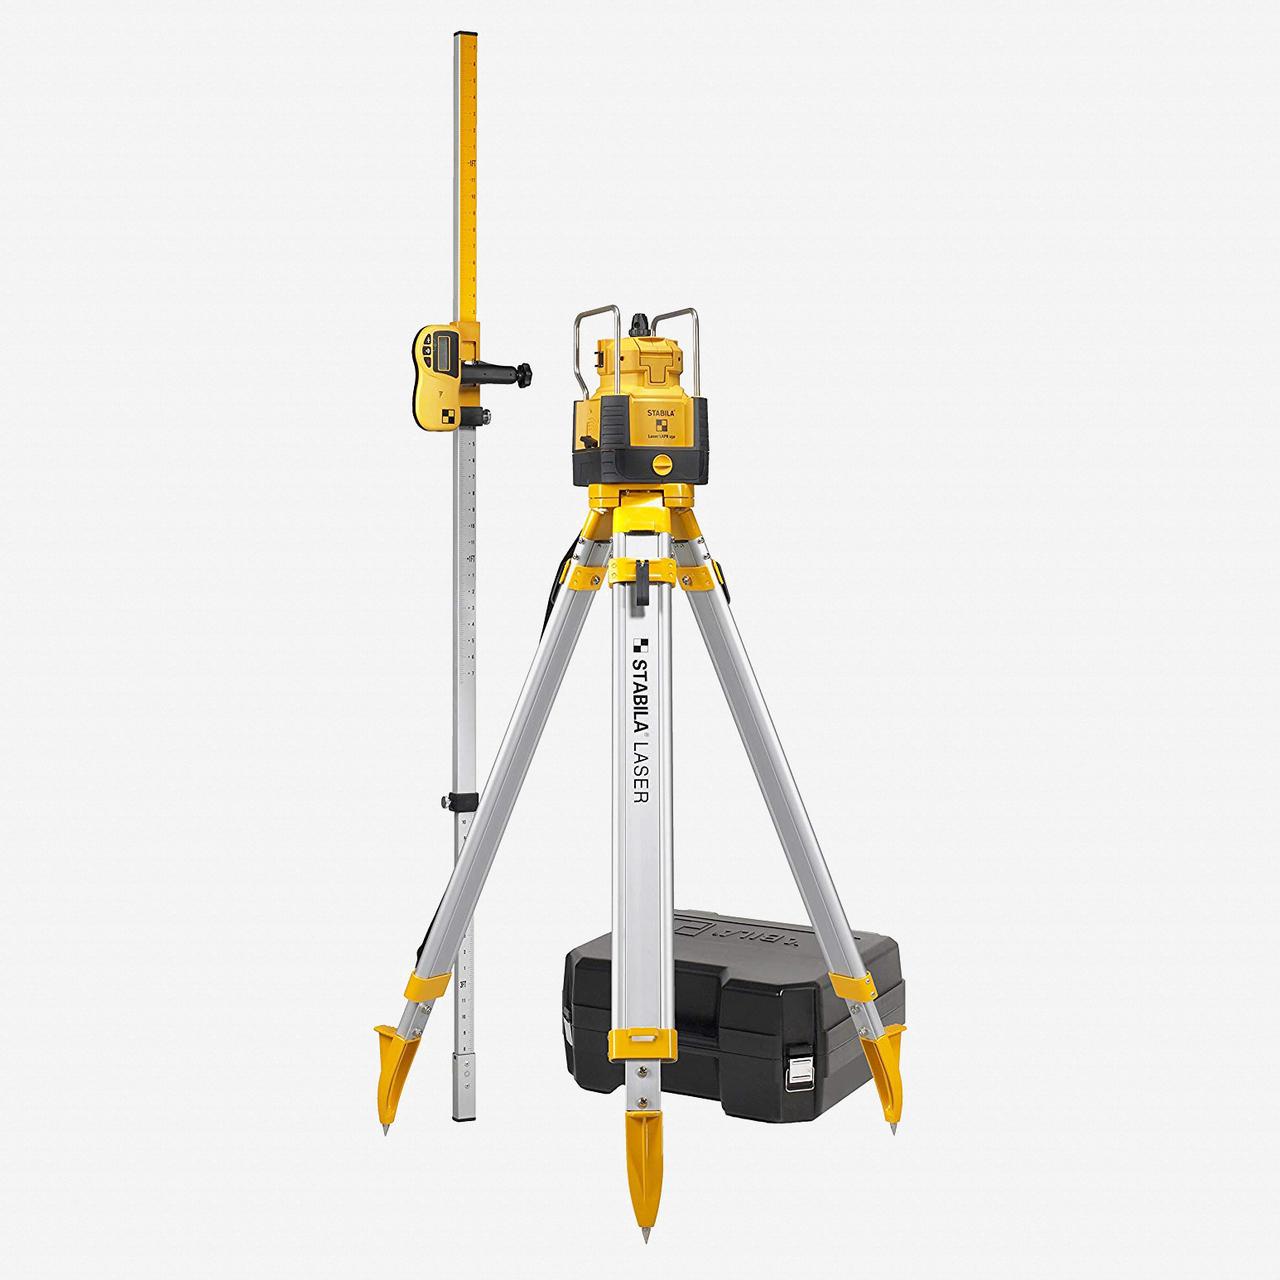 Stabila 05155 LAPR 150 Res-Con Rotating Laser - KC Tool